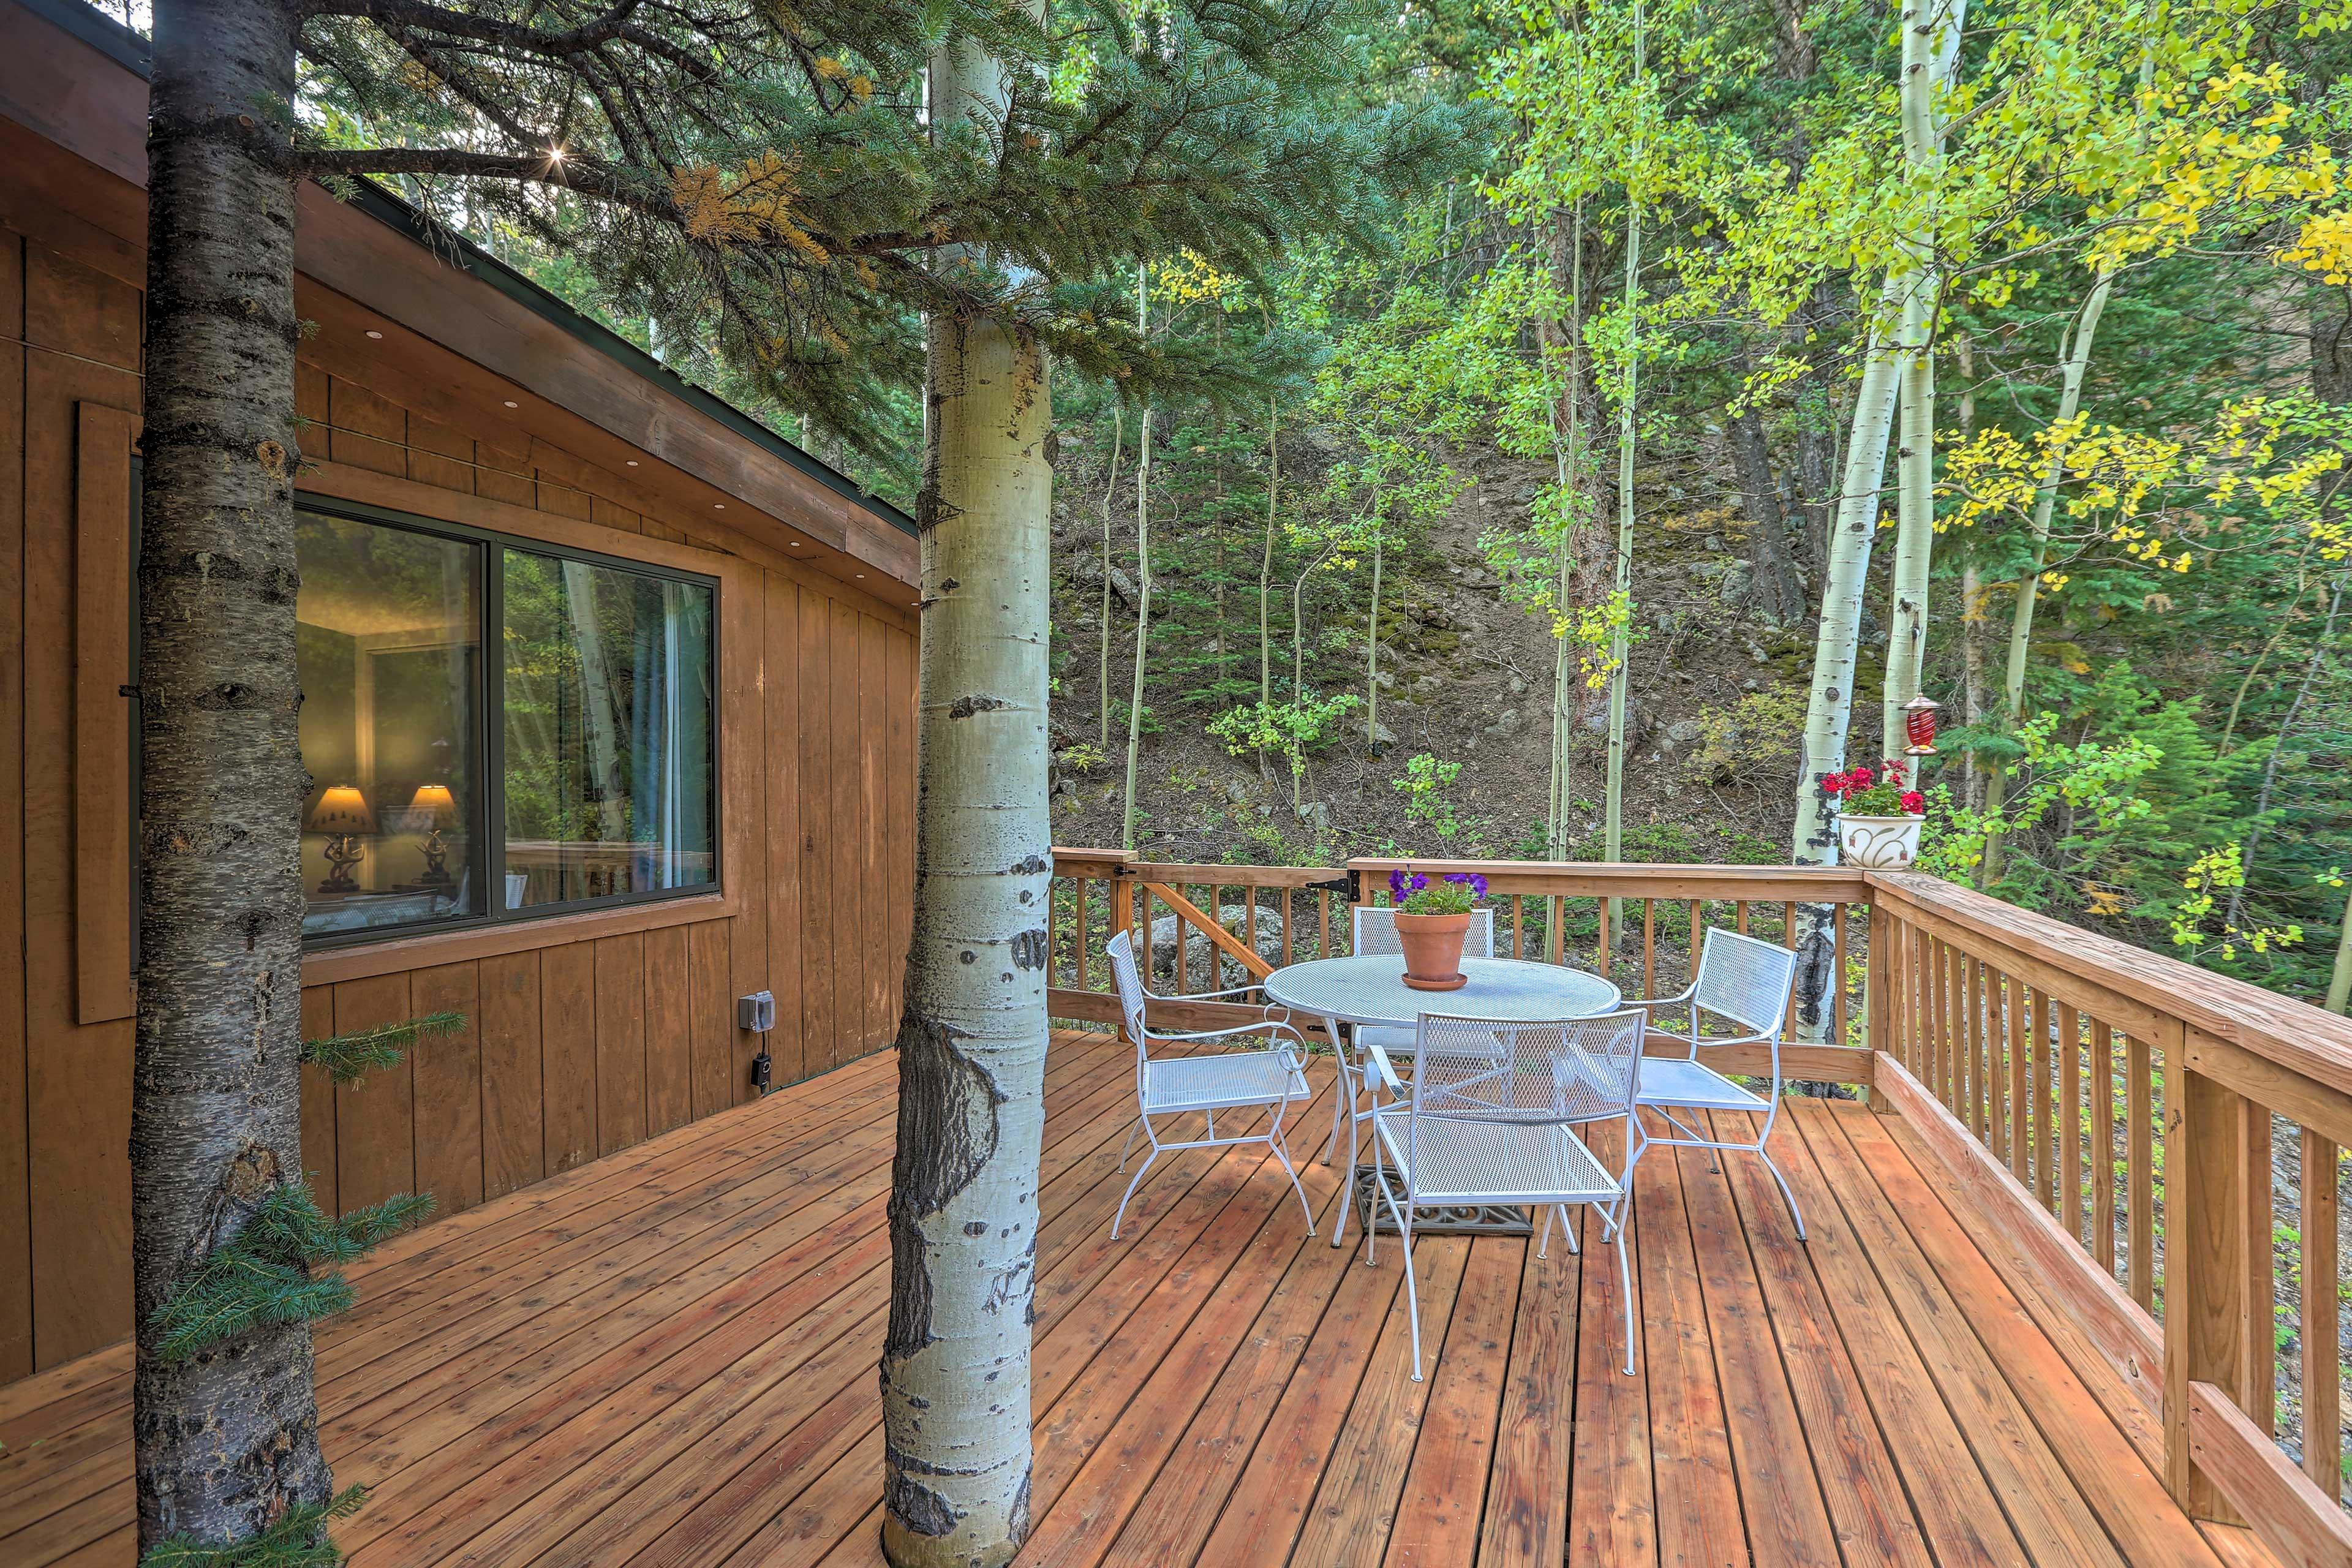 Enjoy evenings on the deck.